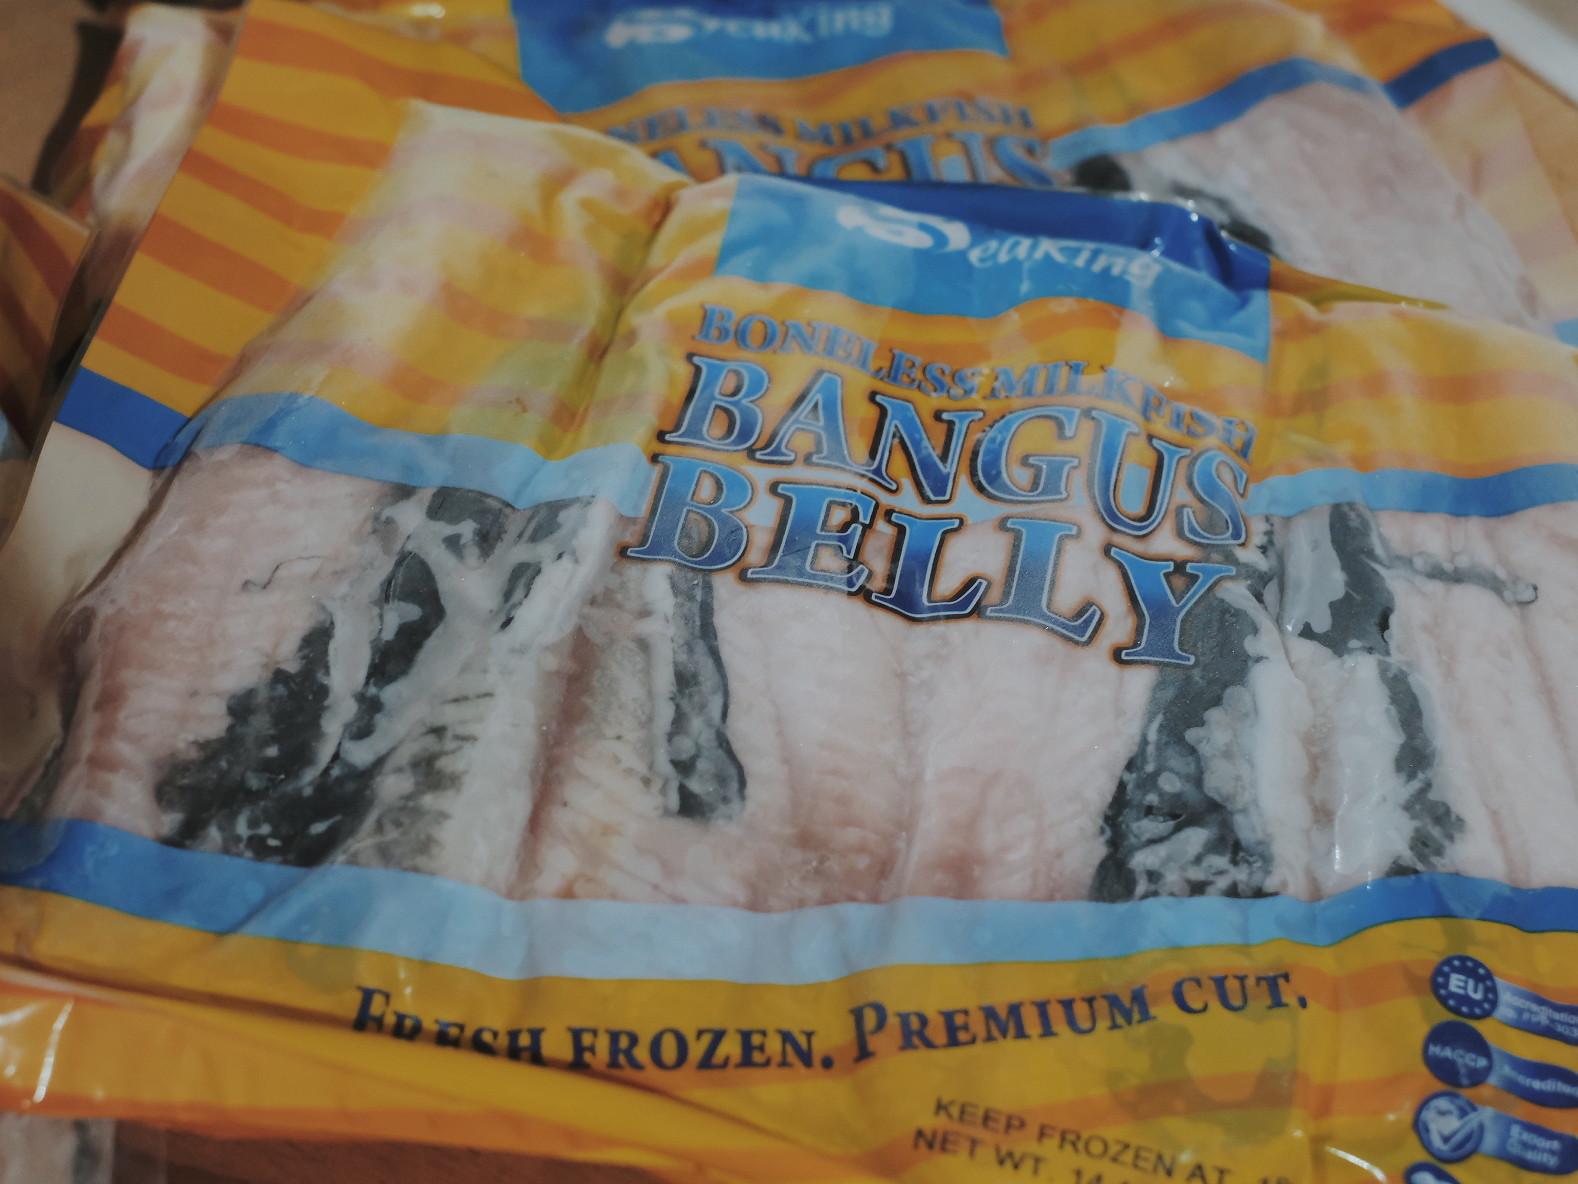 Easy Recipe: Sinigang na Bangus Using Sea King Boneless Bangus